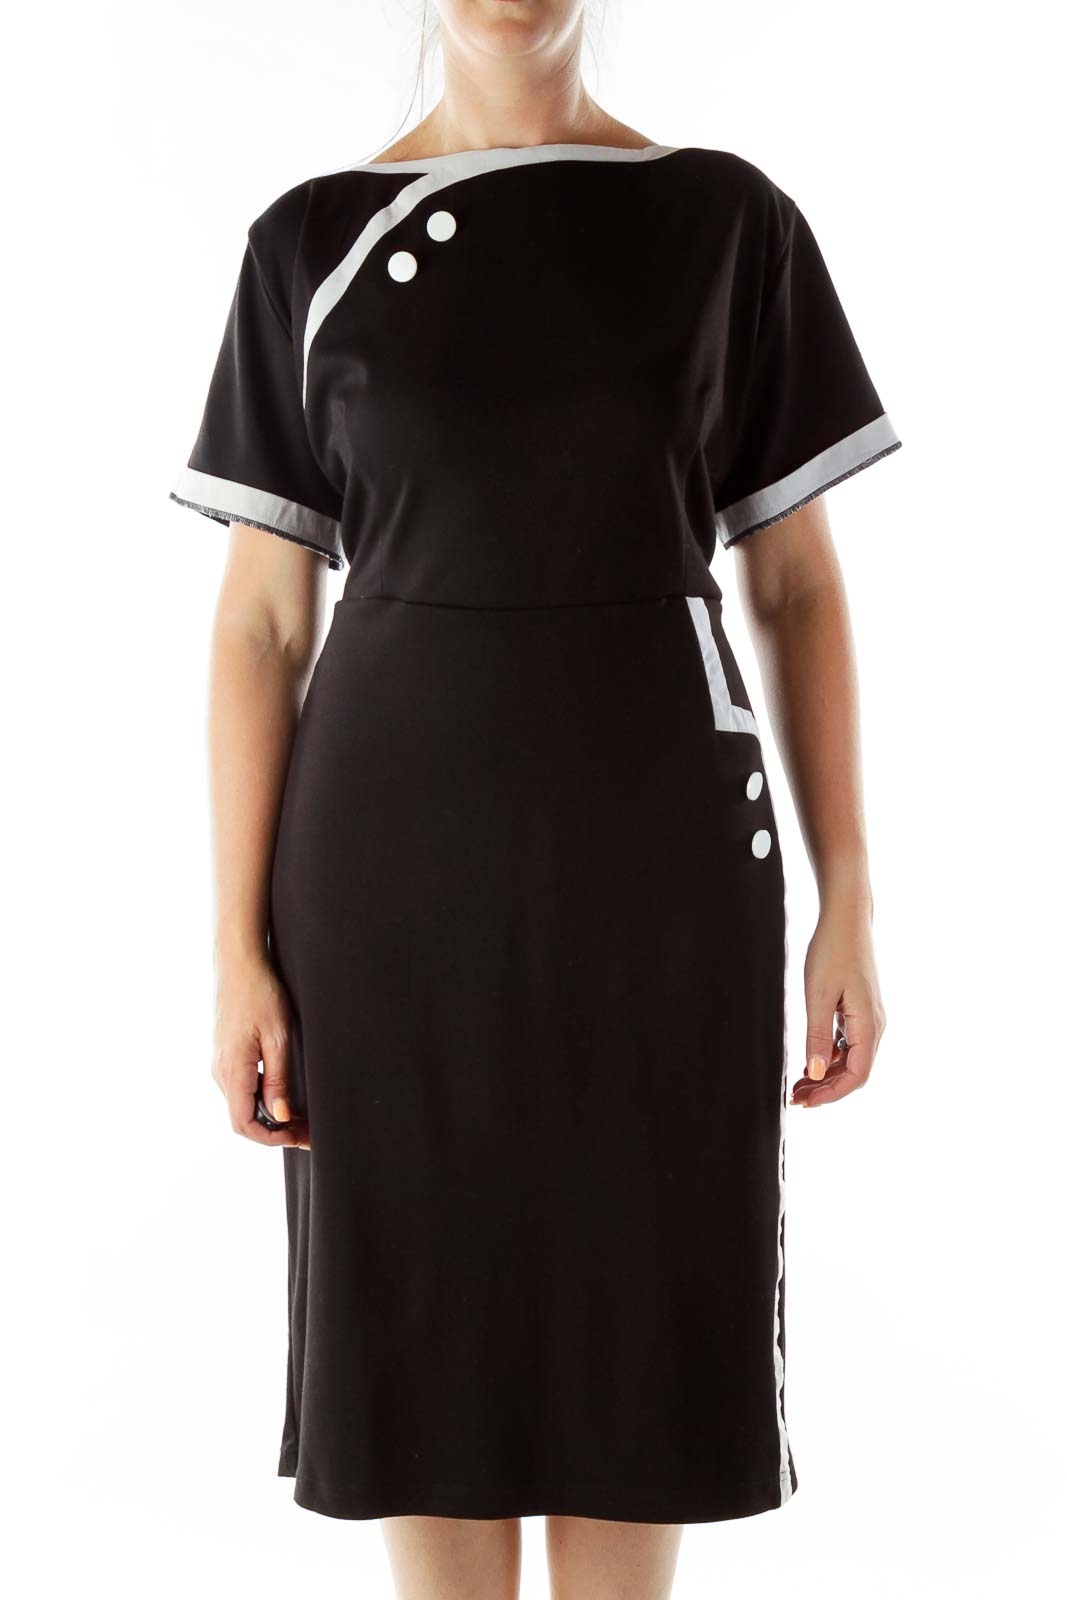 Black White Buttoned Vintage A-Line Dress